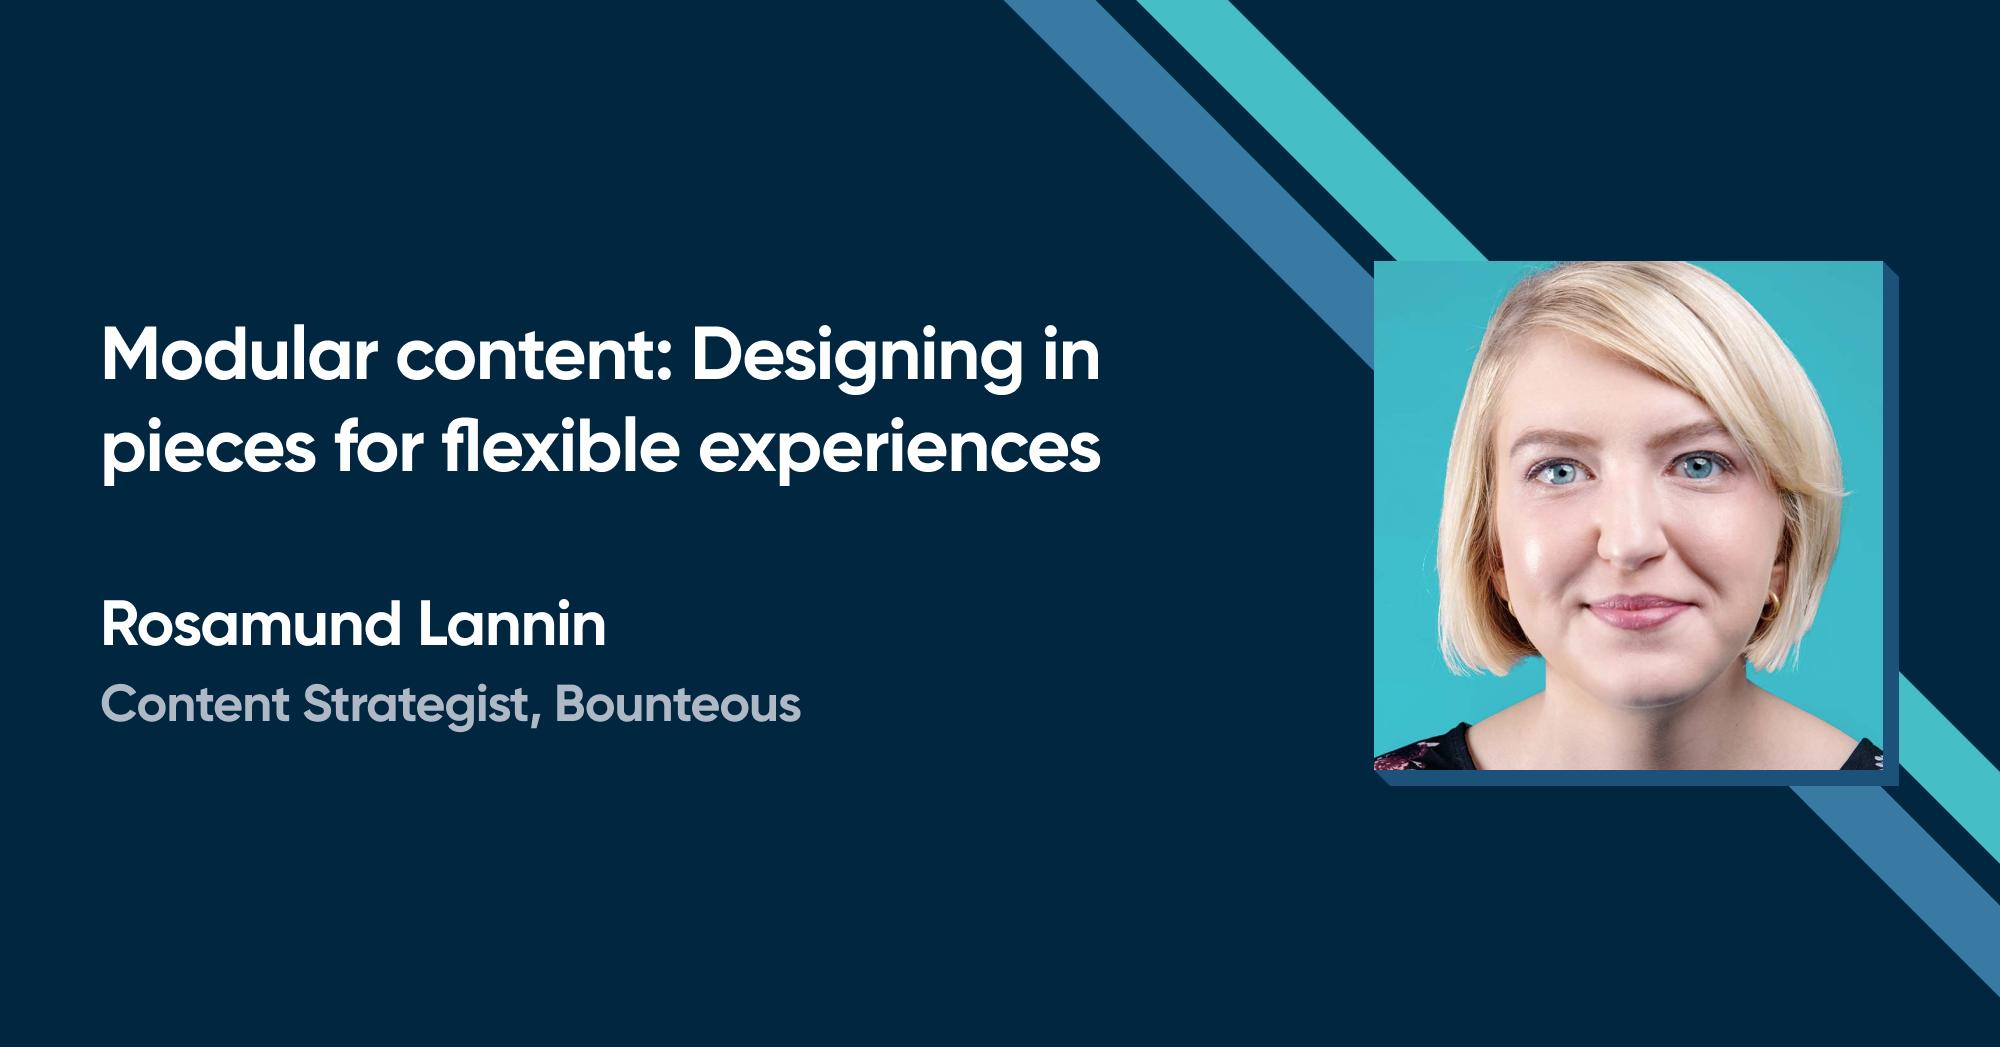 Rosamund Lannin - Modular content: Designing in pieces for flexible experiences